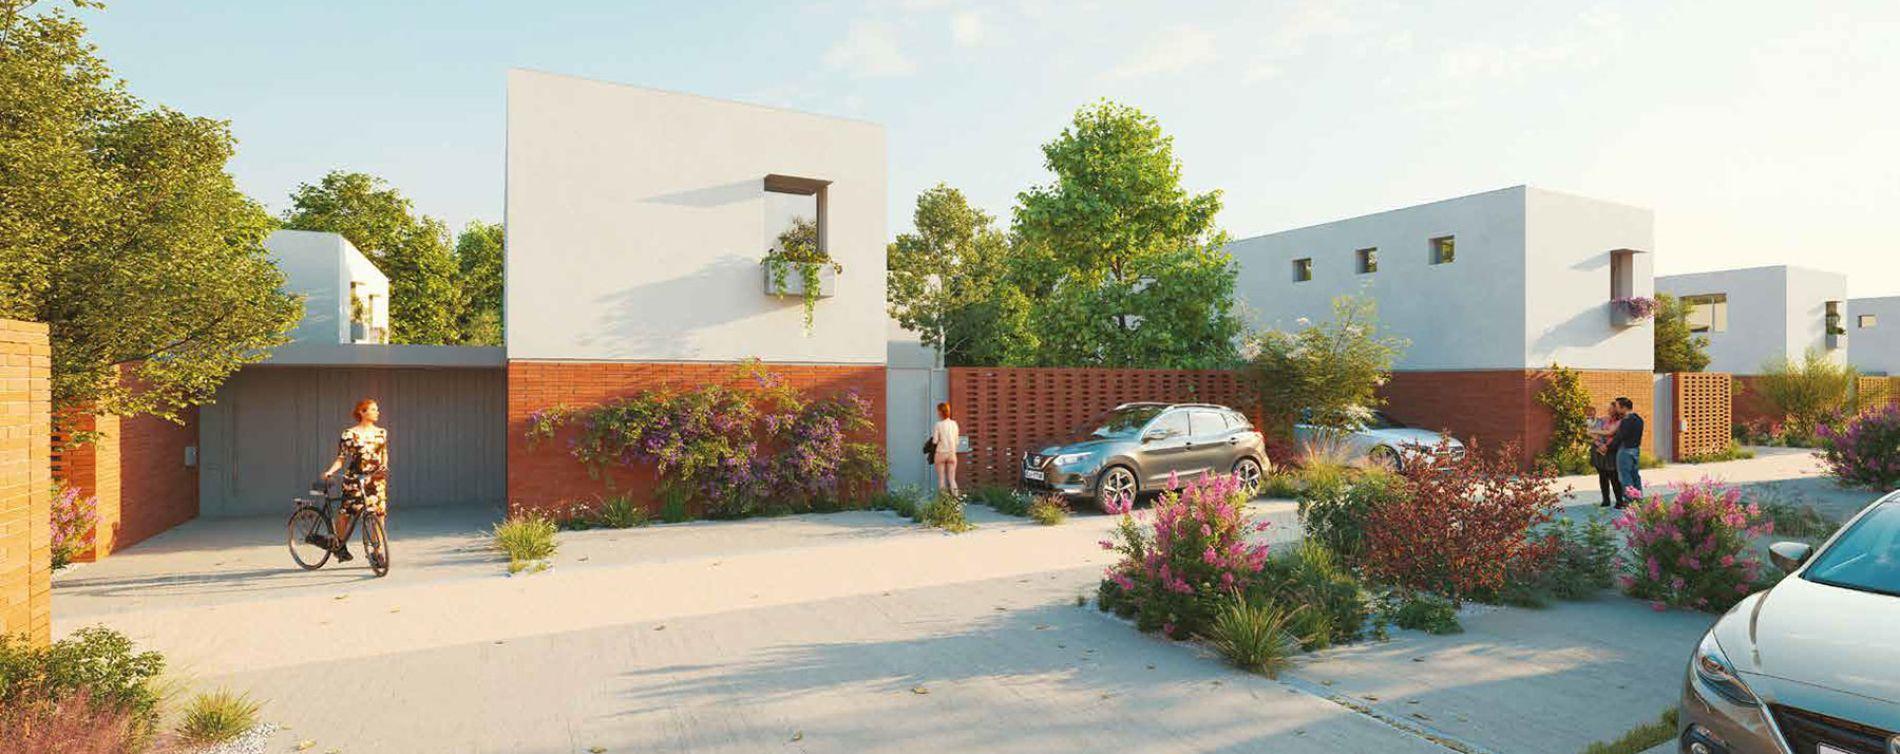 Beauzelle : programme immobilier neuve « Poppy » (3)